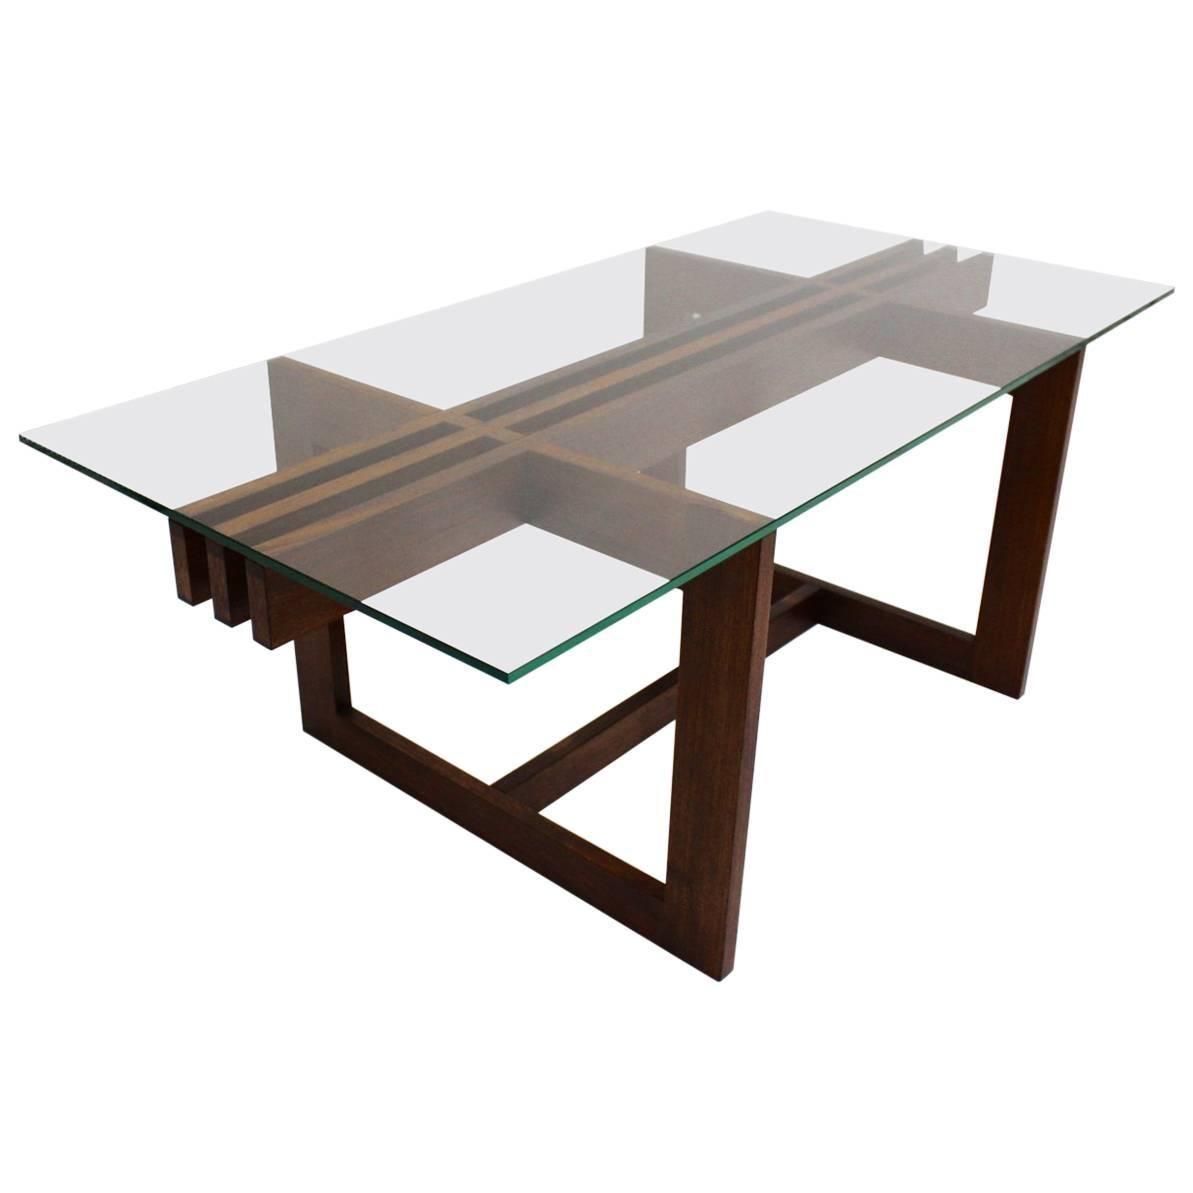 Scandinavian Modern Vintage Teak Glass Coffee Table Denmark, 1960s